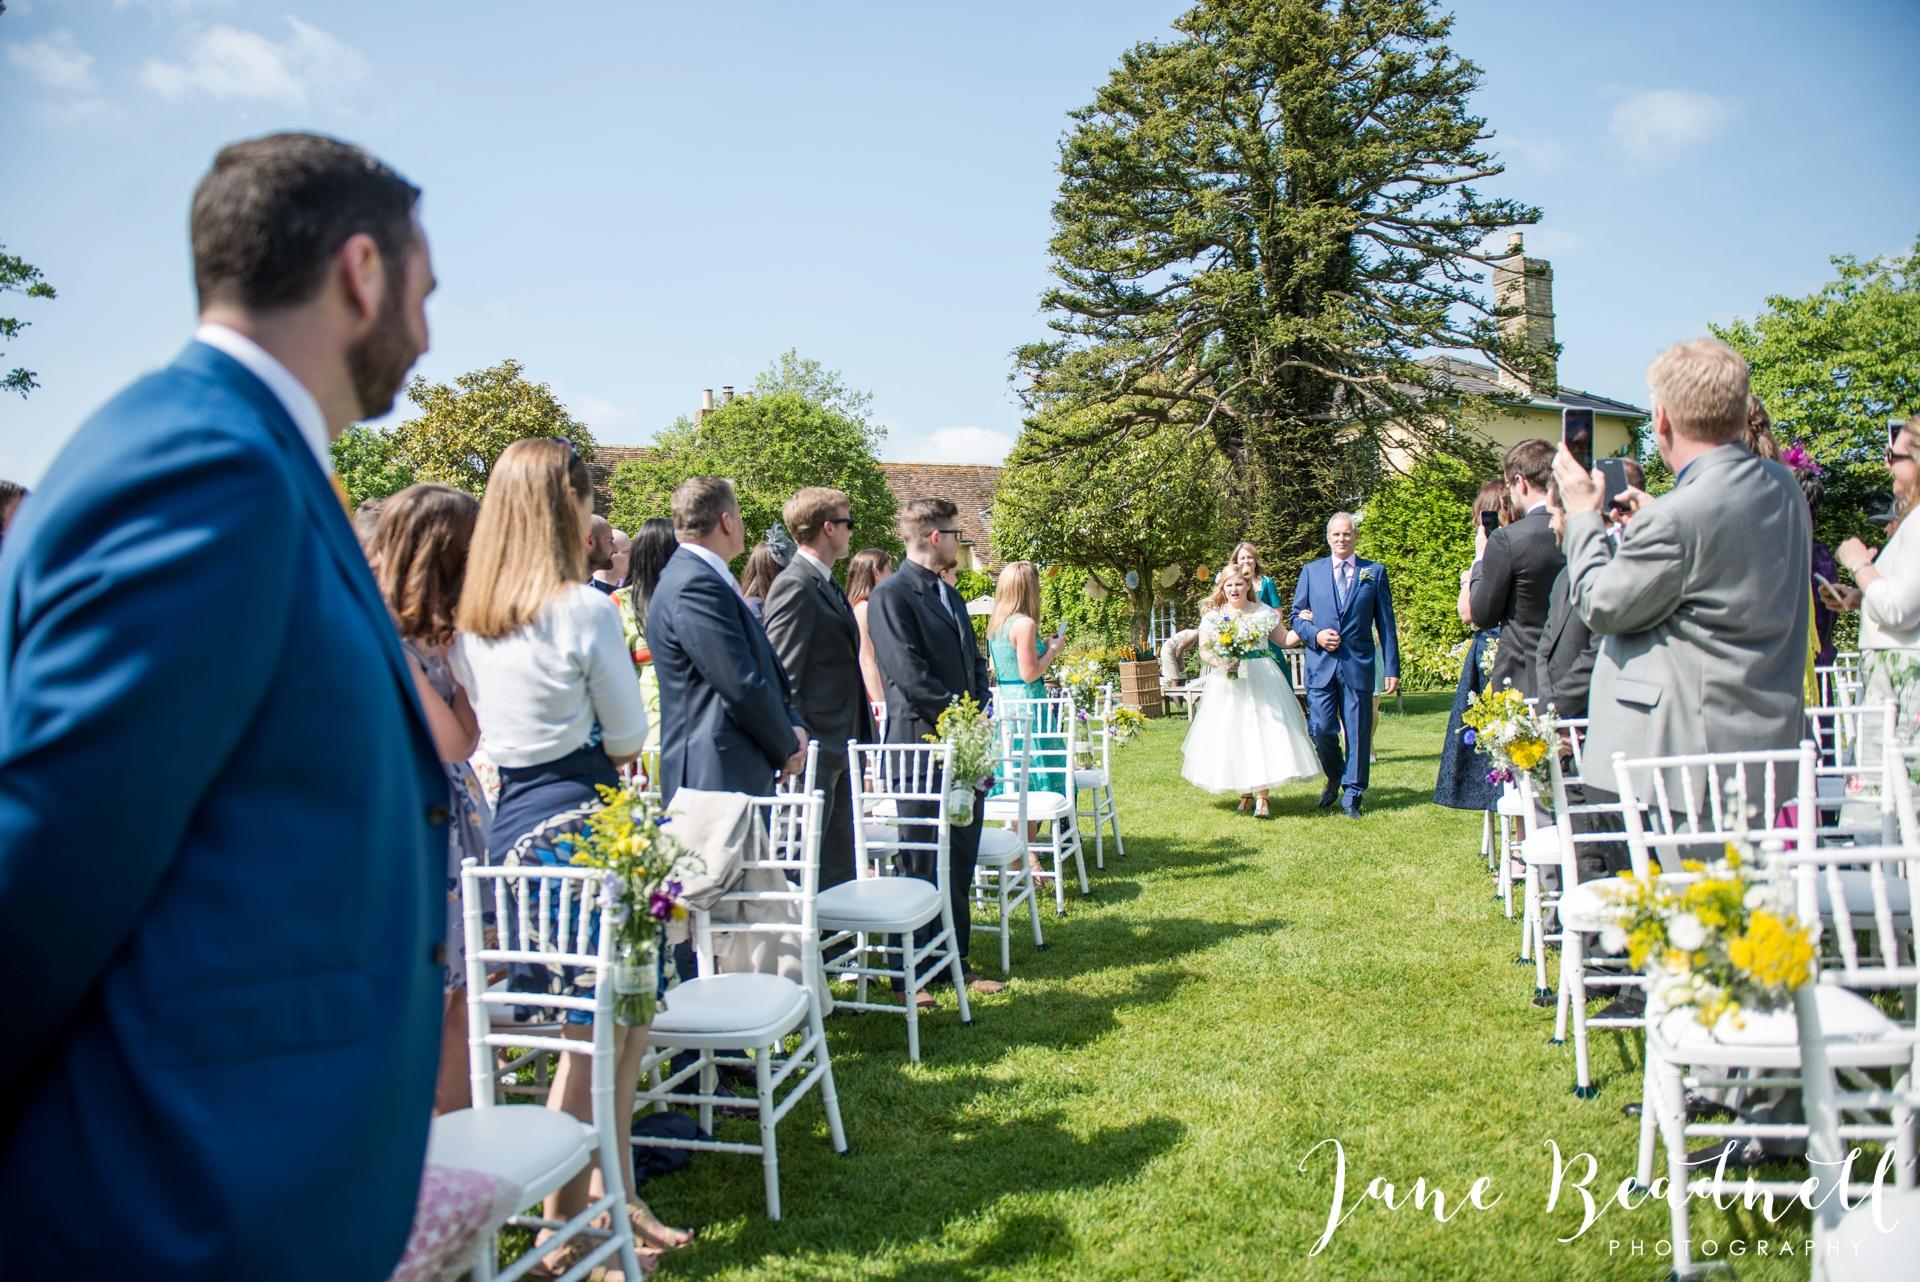 South Farm Wedding photography Hertfordshire by Jane Beadnell Photography fine art wedding photographer_0061